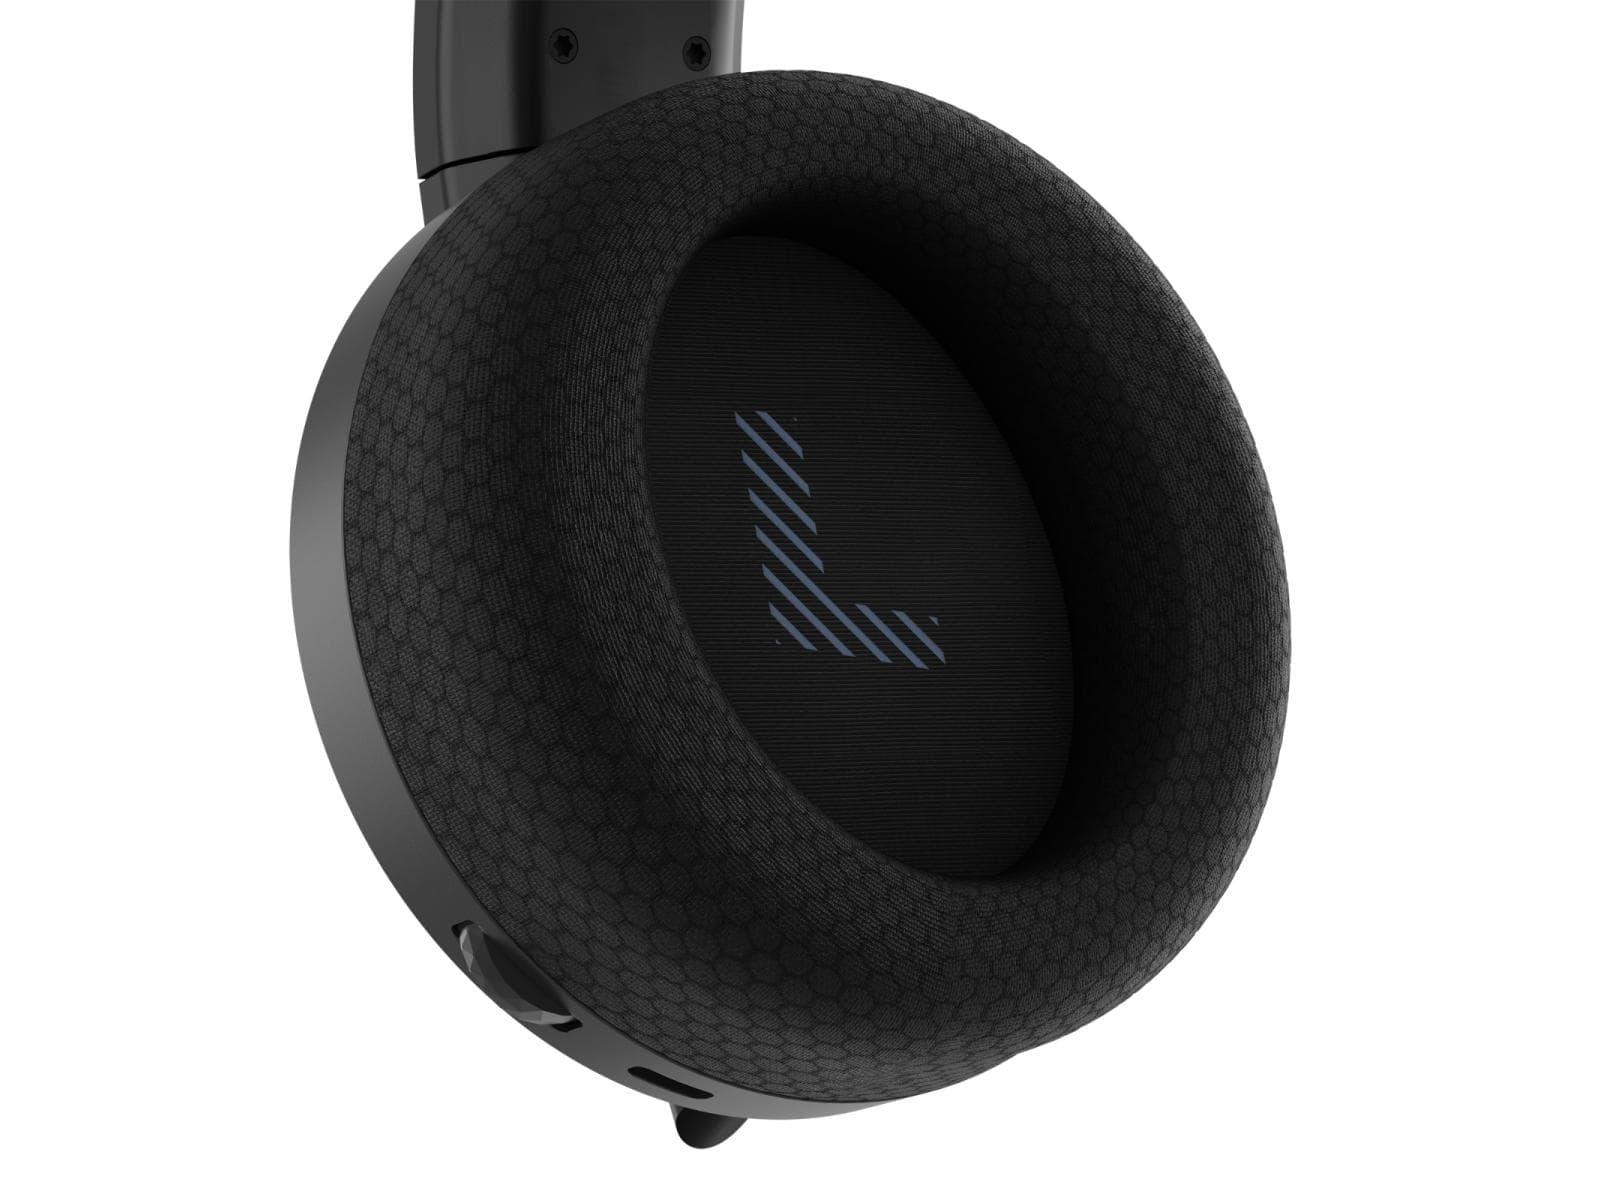 07 Lenovo Legion H600 Wireless Gaming Headset Closeup Earcup